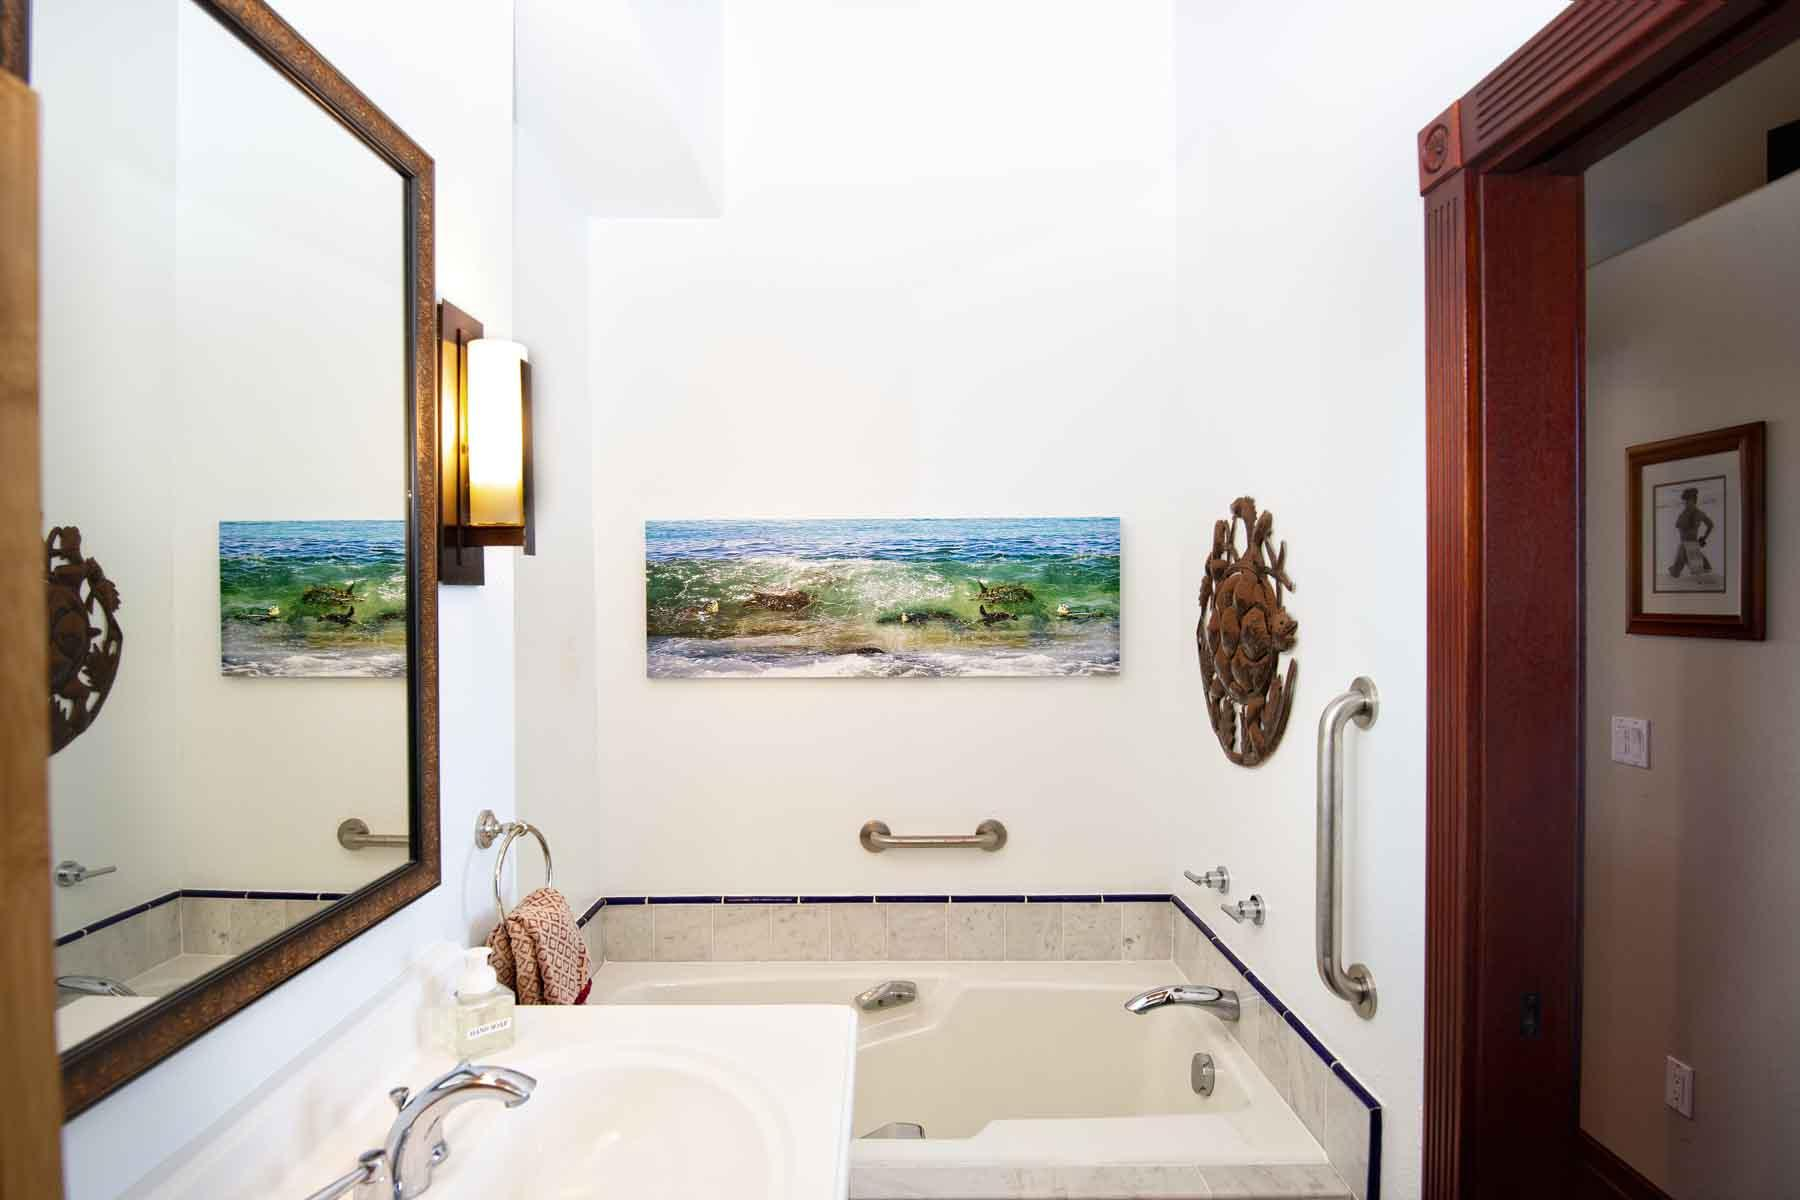 Master bathroom right view: deep soaking tub.